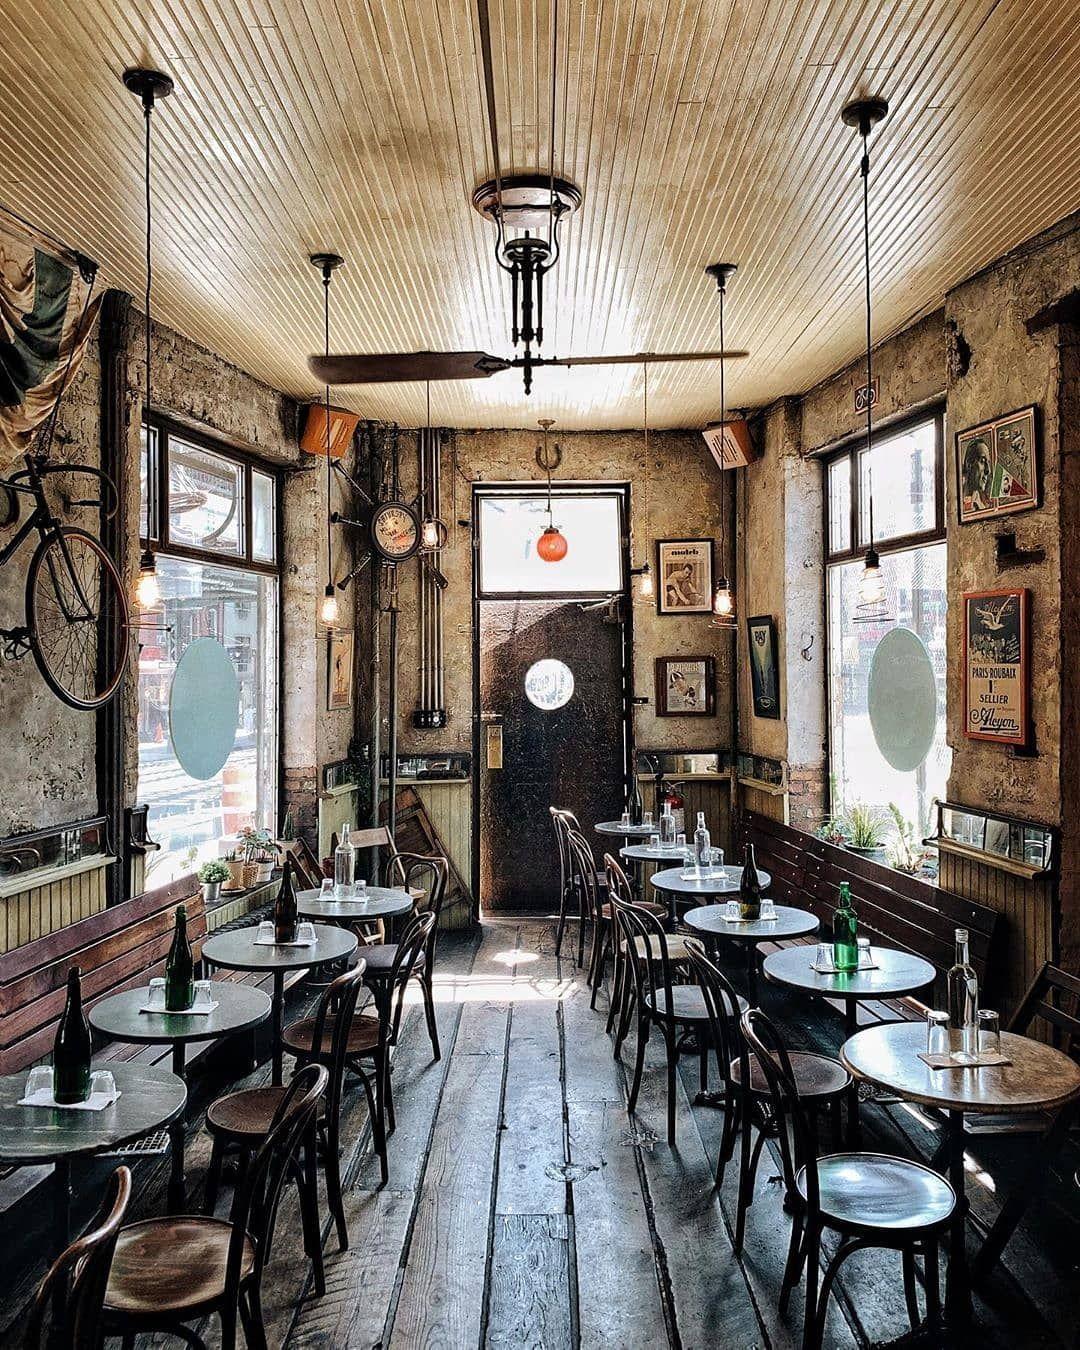 Design Dautore Com On Instagram R Bar Velo Brooklyn Nyc By Heydavina Nyc Interior Interiors Bar Br Cafe New York Bar Design Restaurant Design